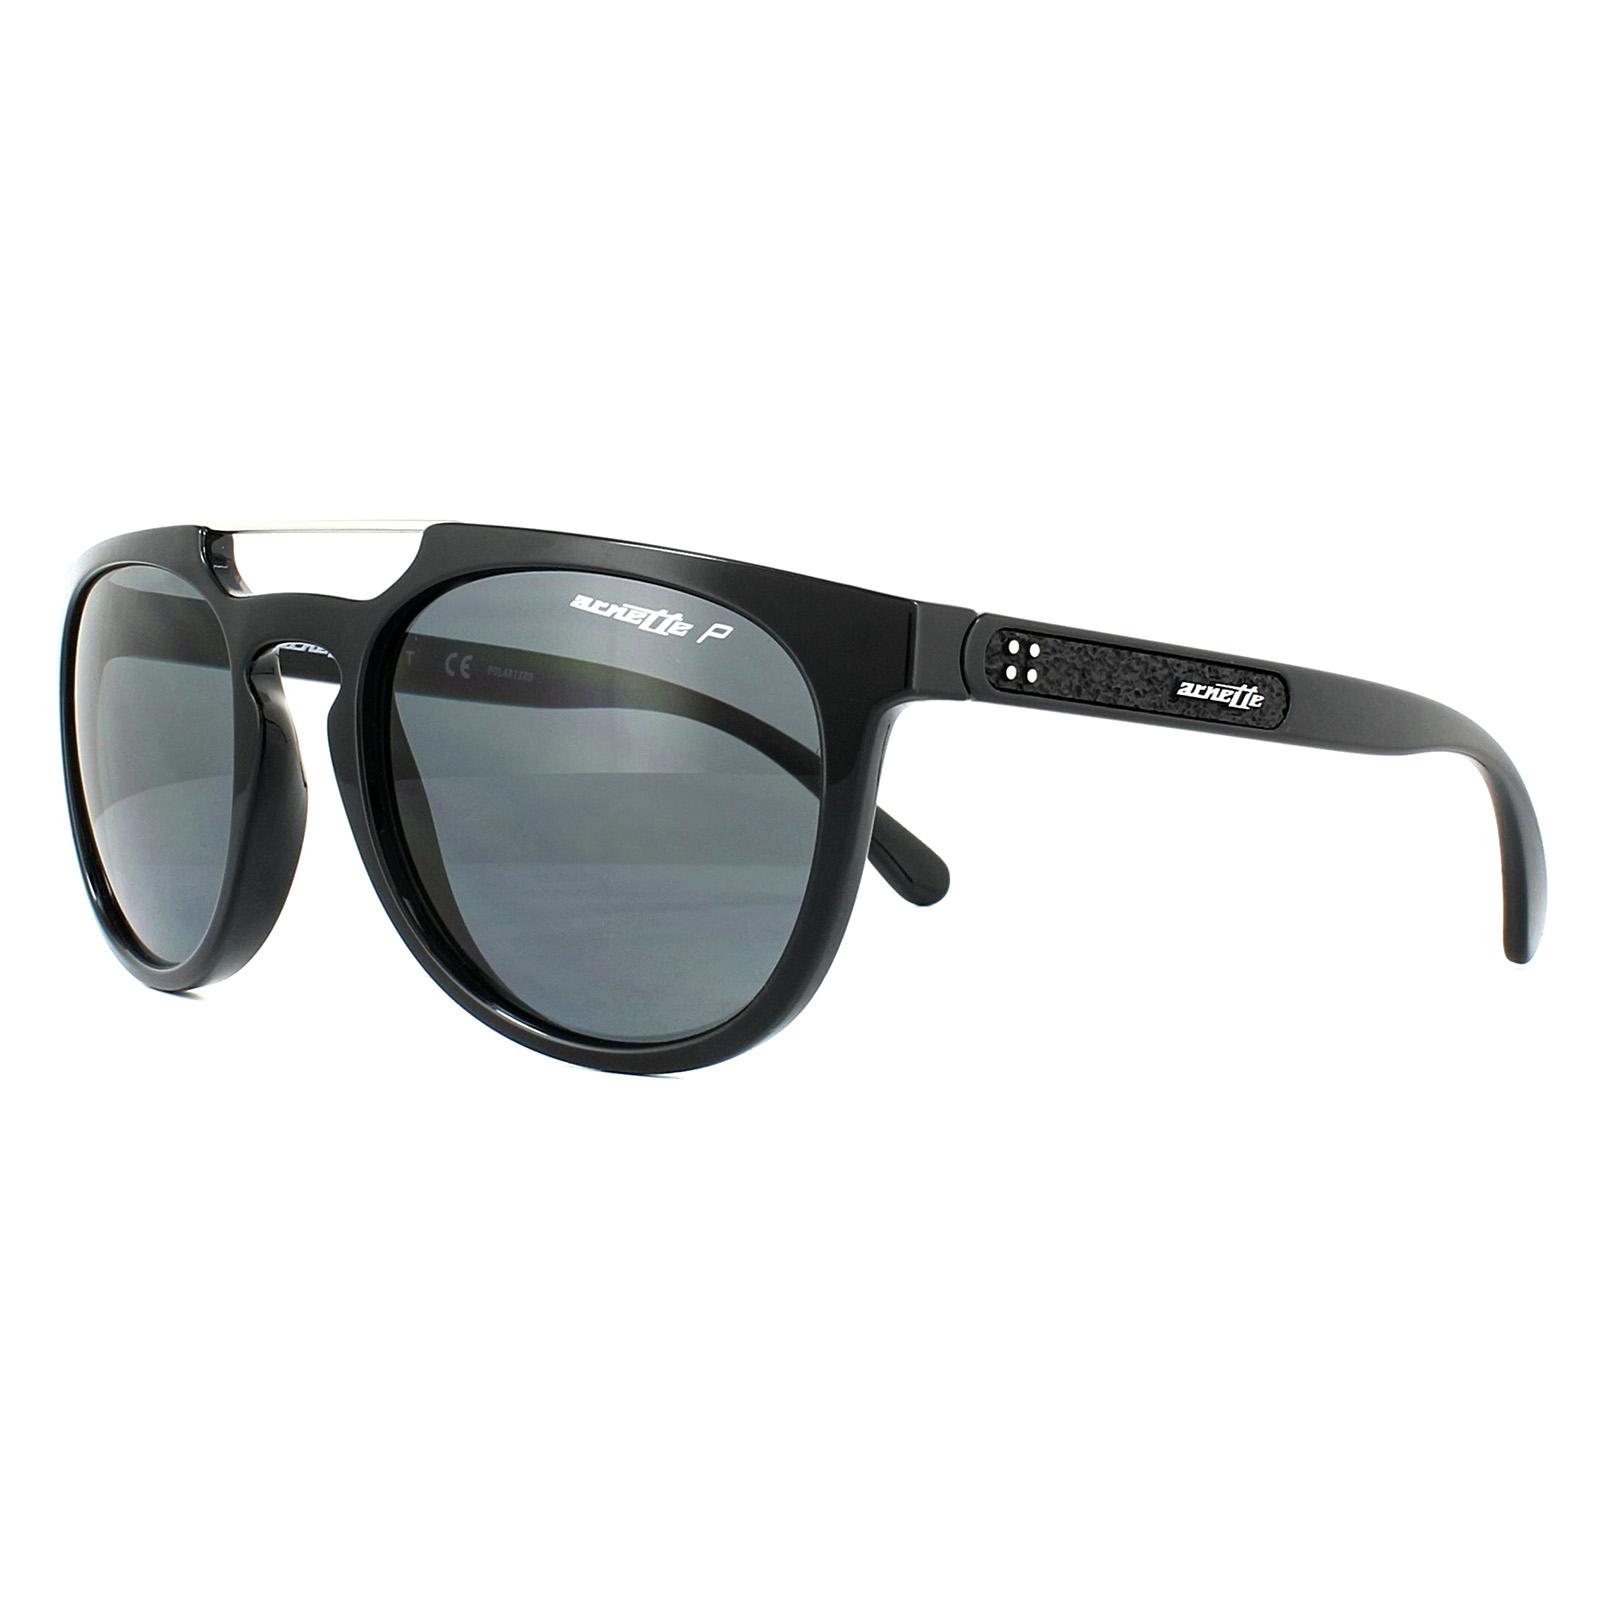 d5887f1223 Sentinel Arnette Sunglasses Woodward 4237 41 81 Black Grey Polarized